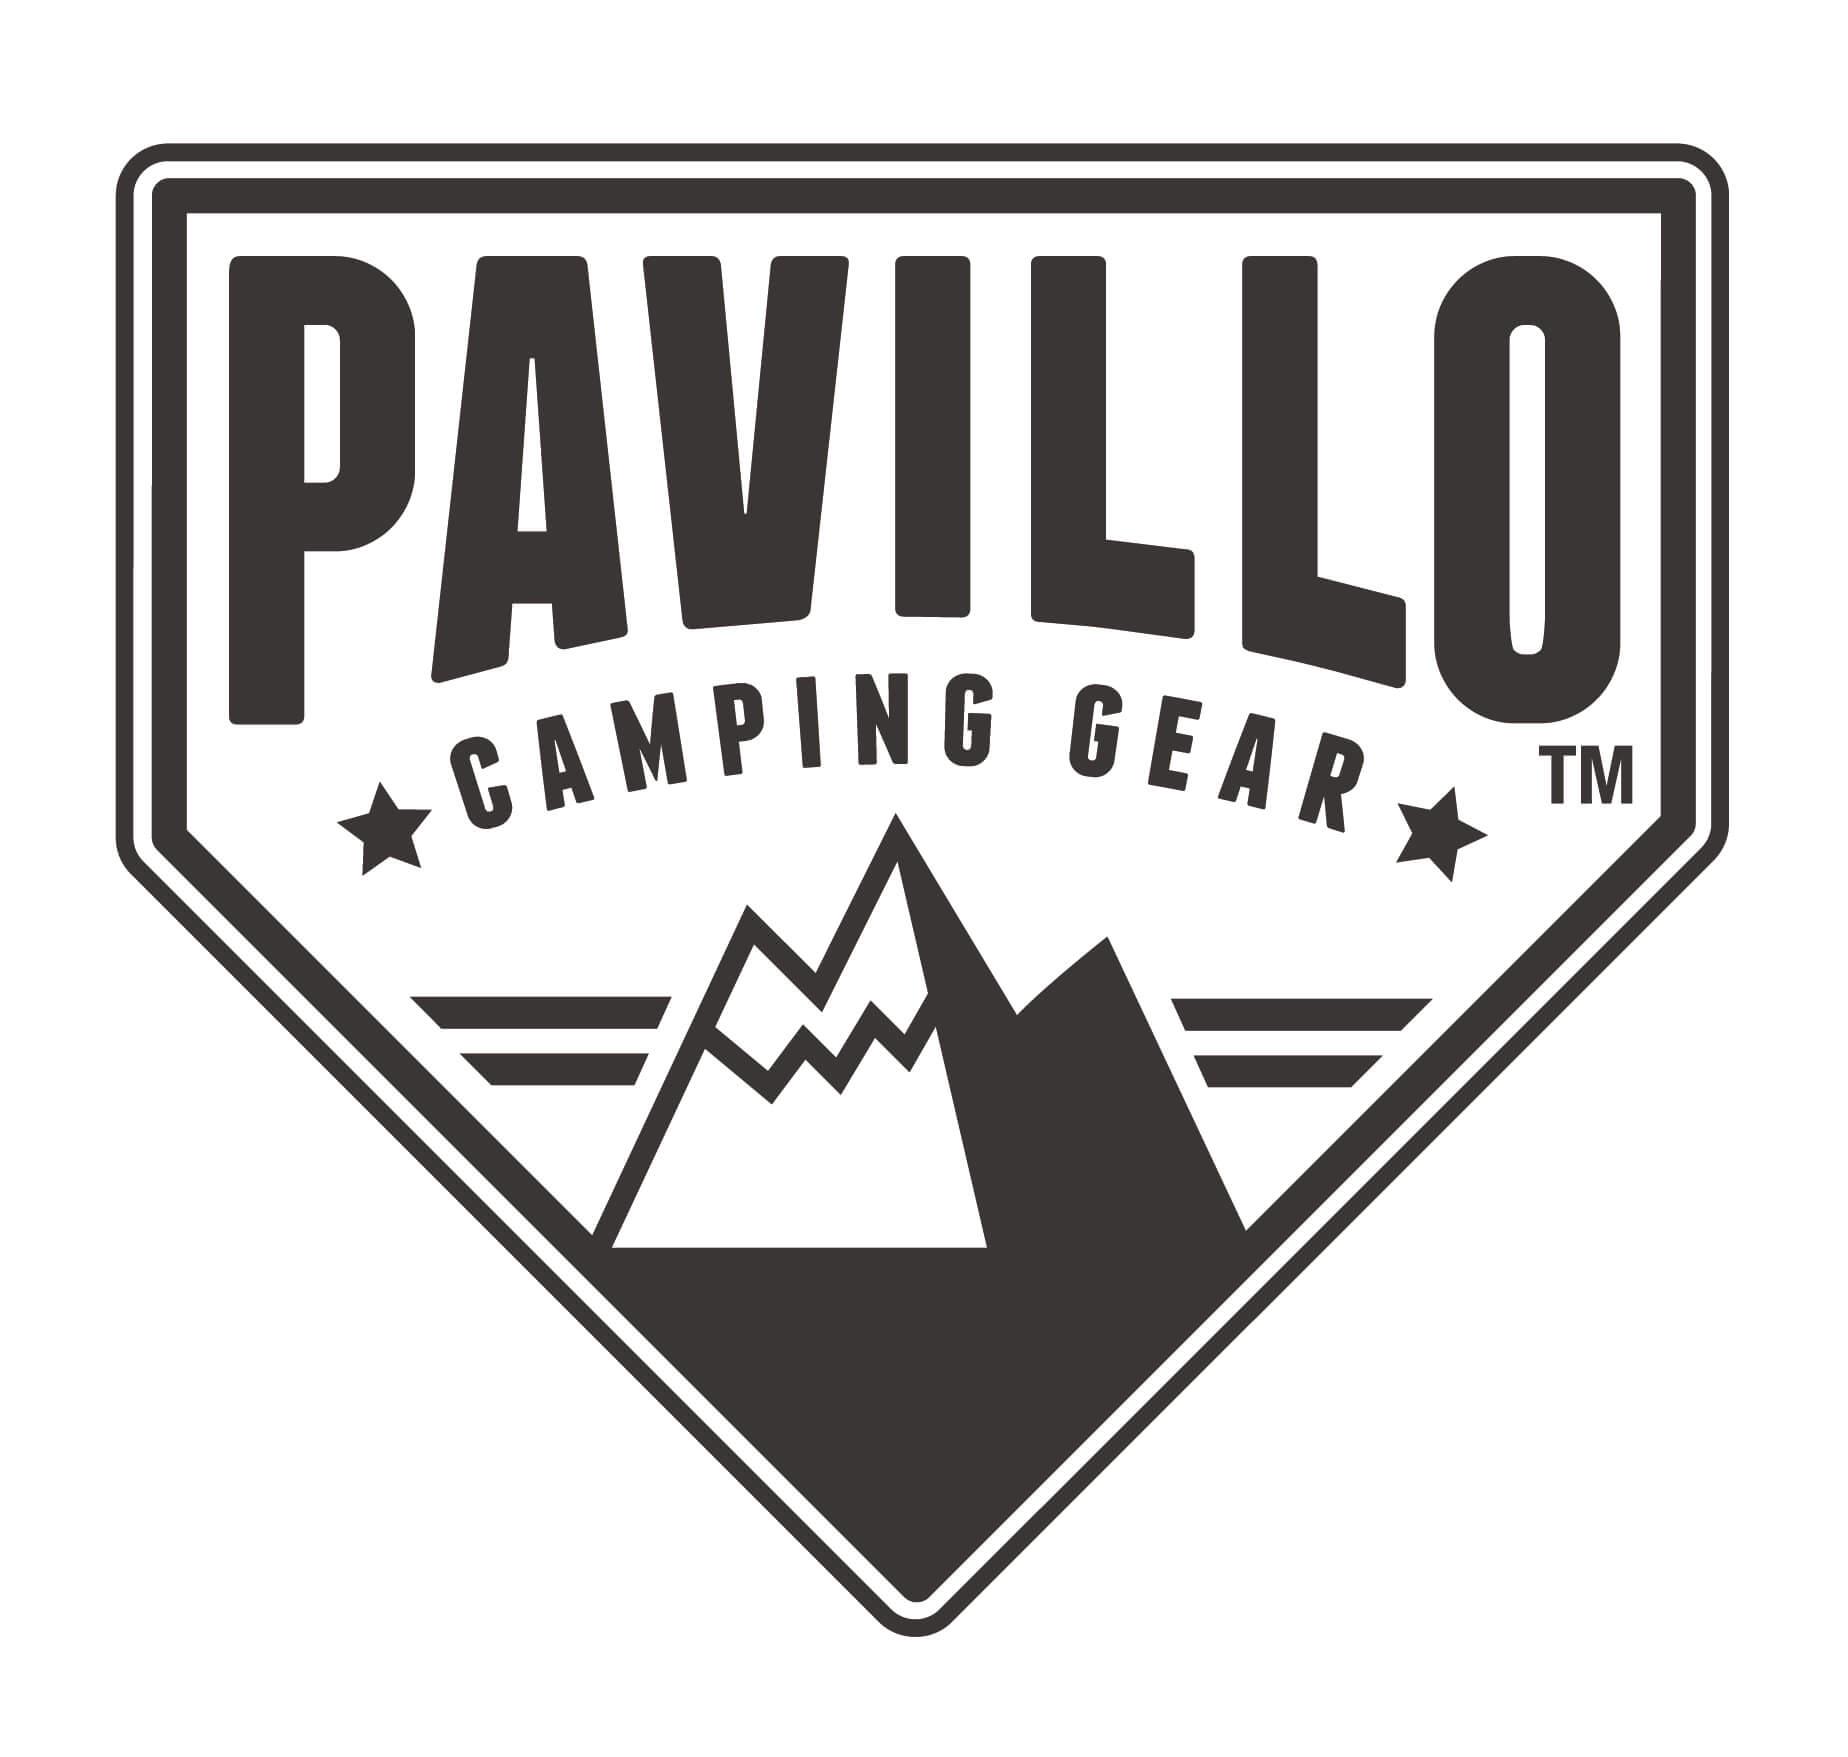 Pavillo